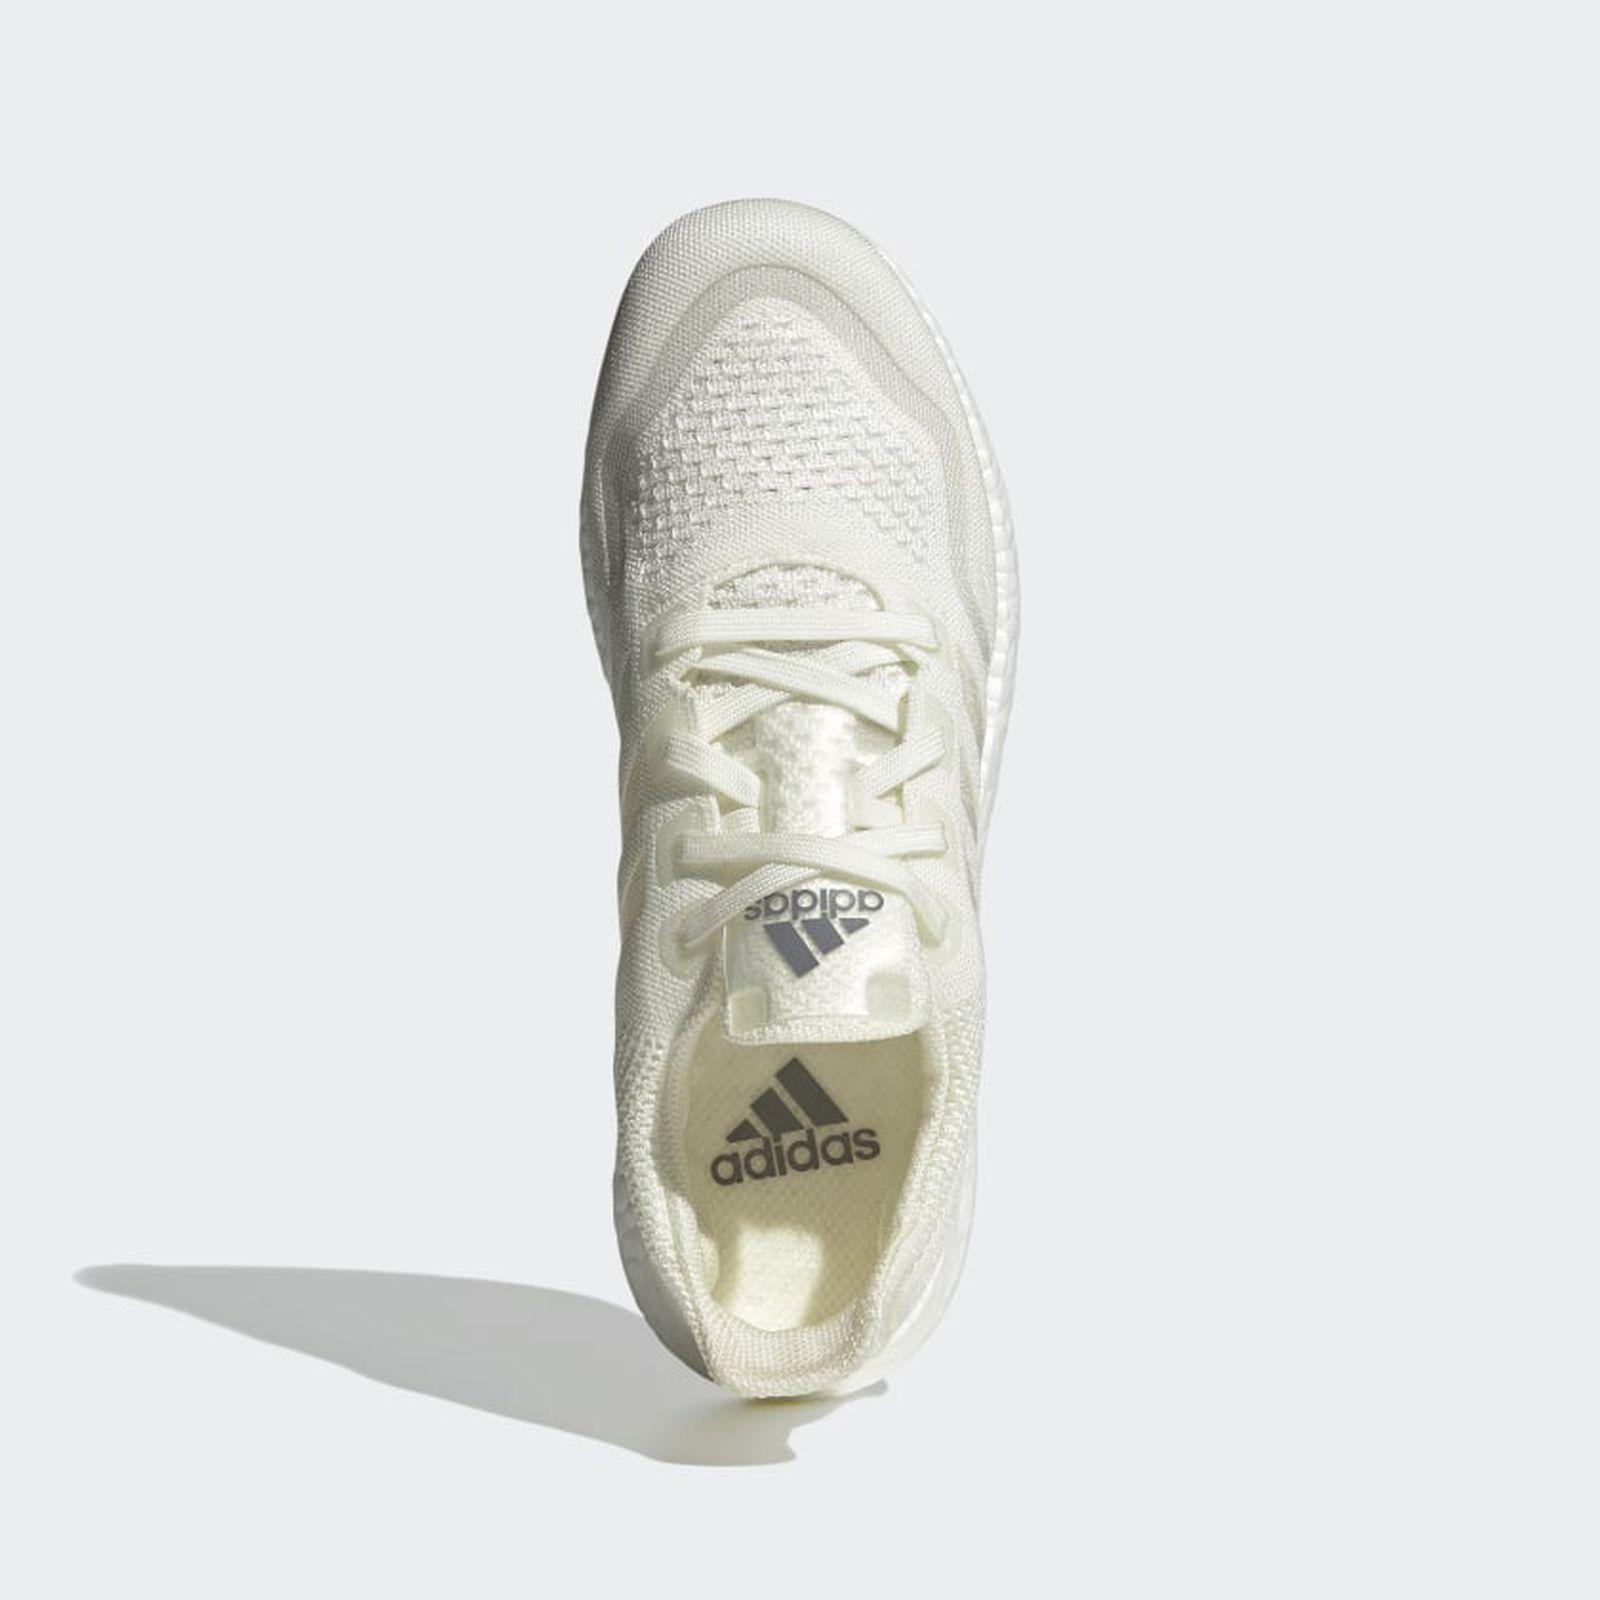 adidas-futurecraft-loop-release-date-price-1-02